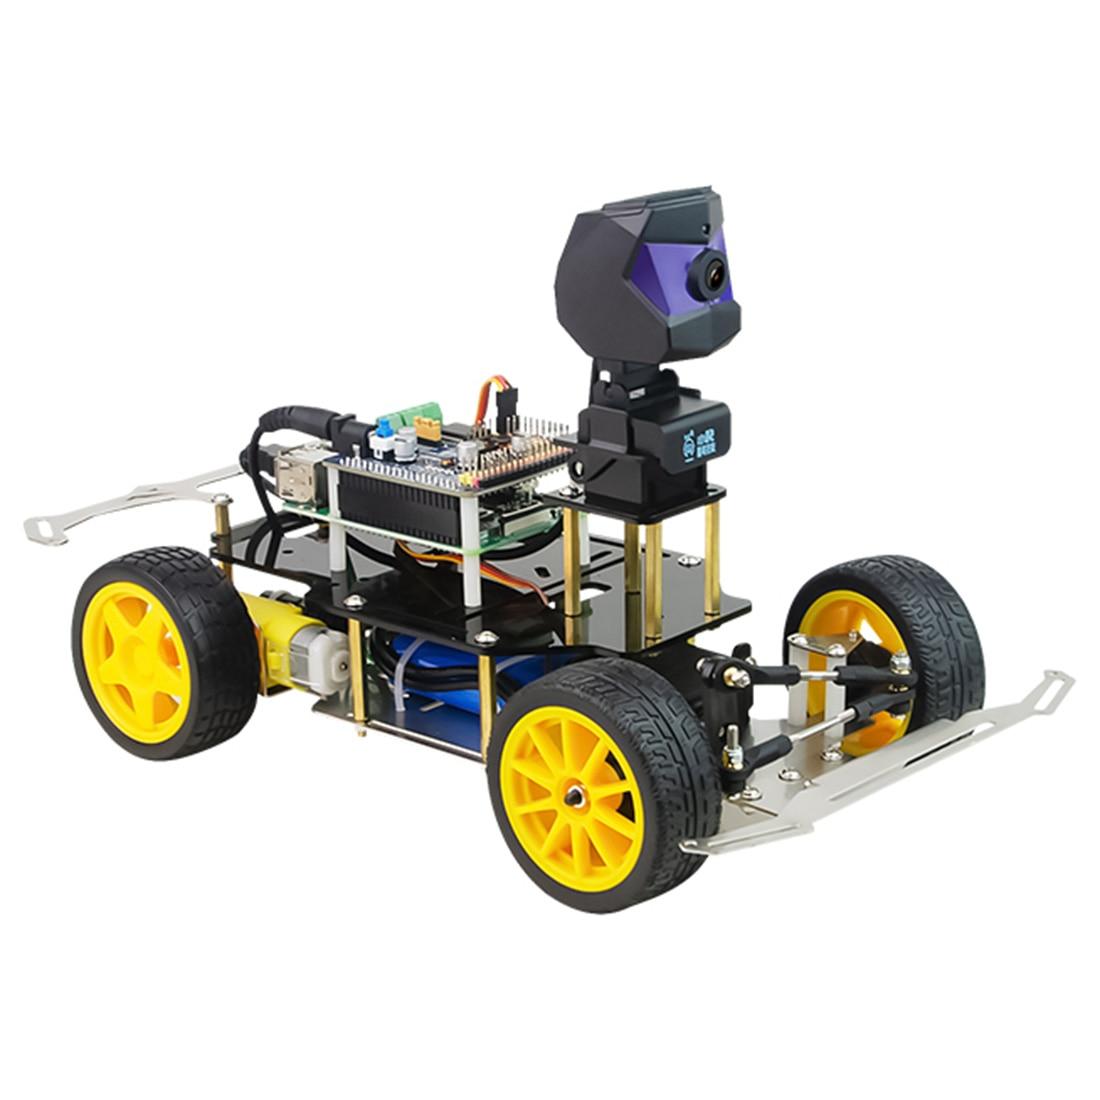 Donkey Car Smart AI Line Follower Robot Opensource DIY Self Driving Platform For Raspberry Pi RC Car BrainTraining Toy For Child